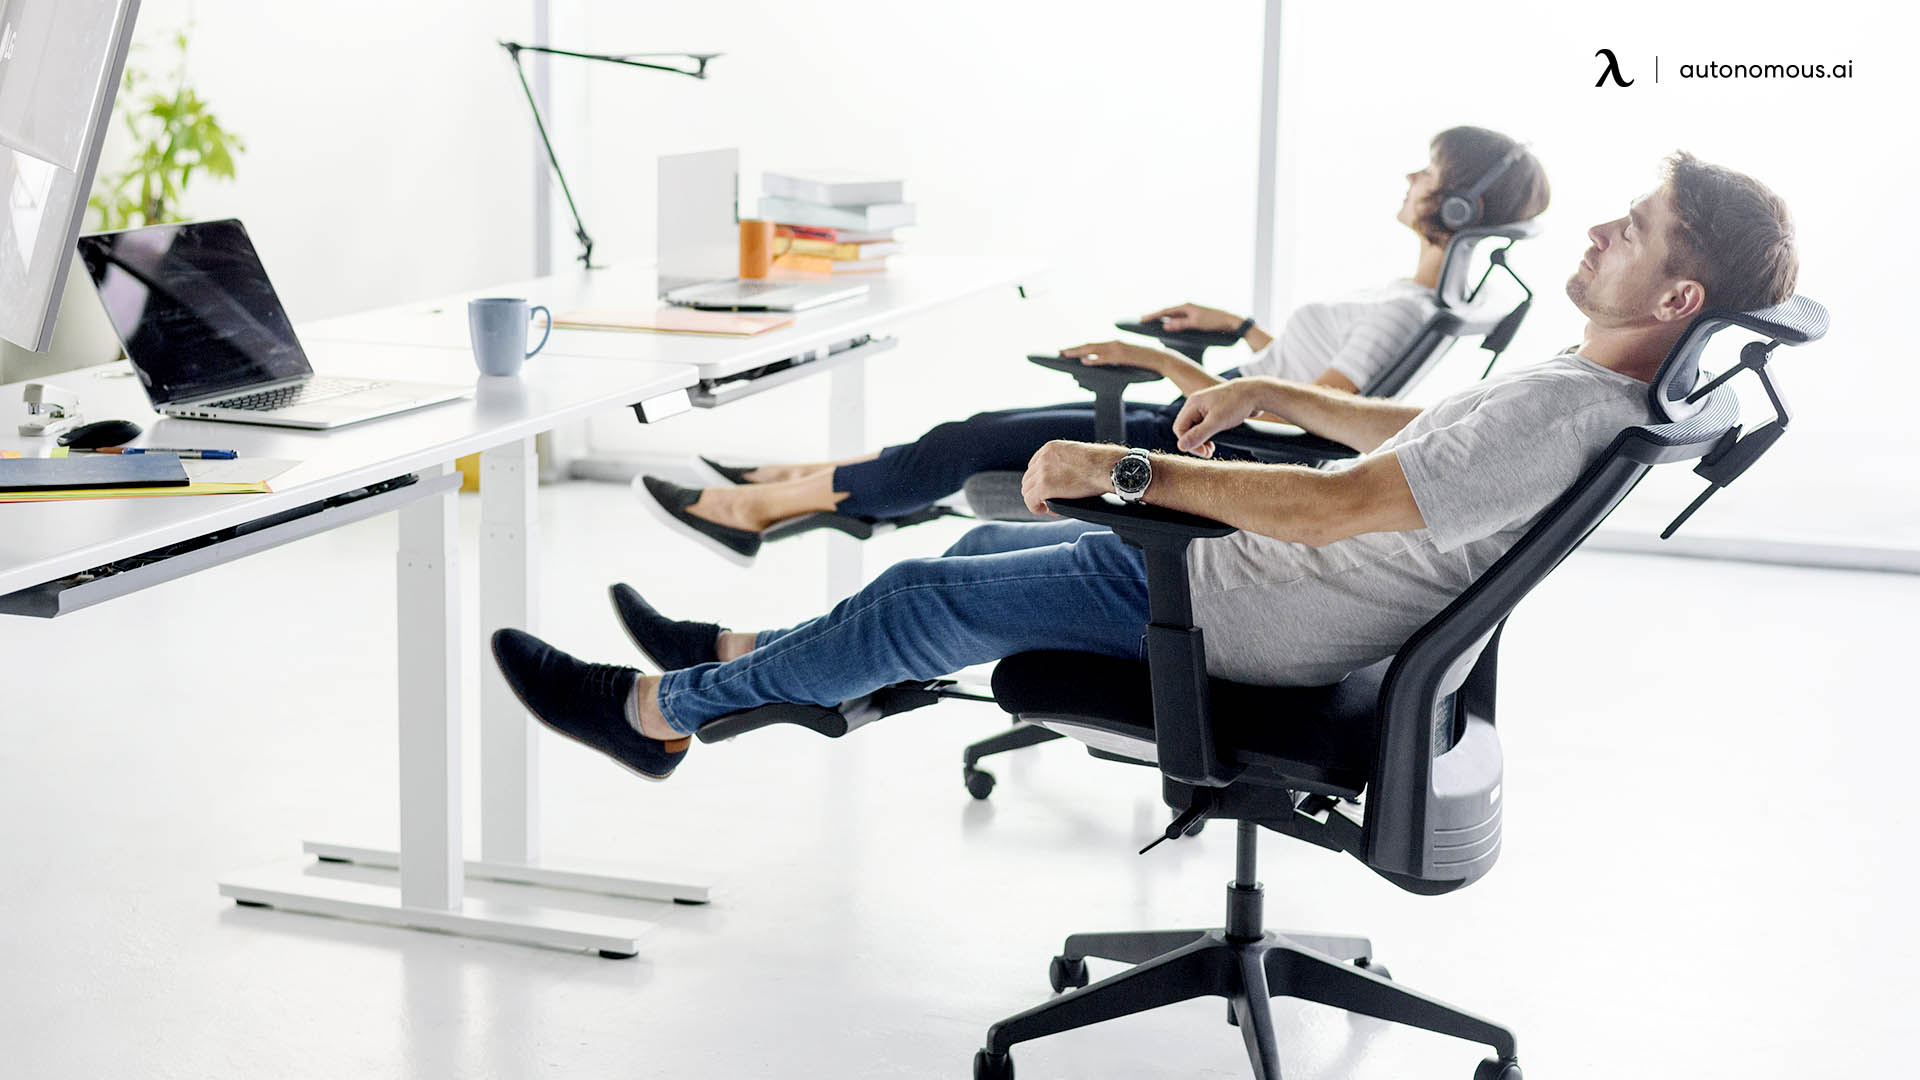 Ergonomic chair help you take a break